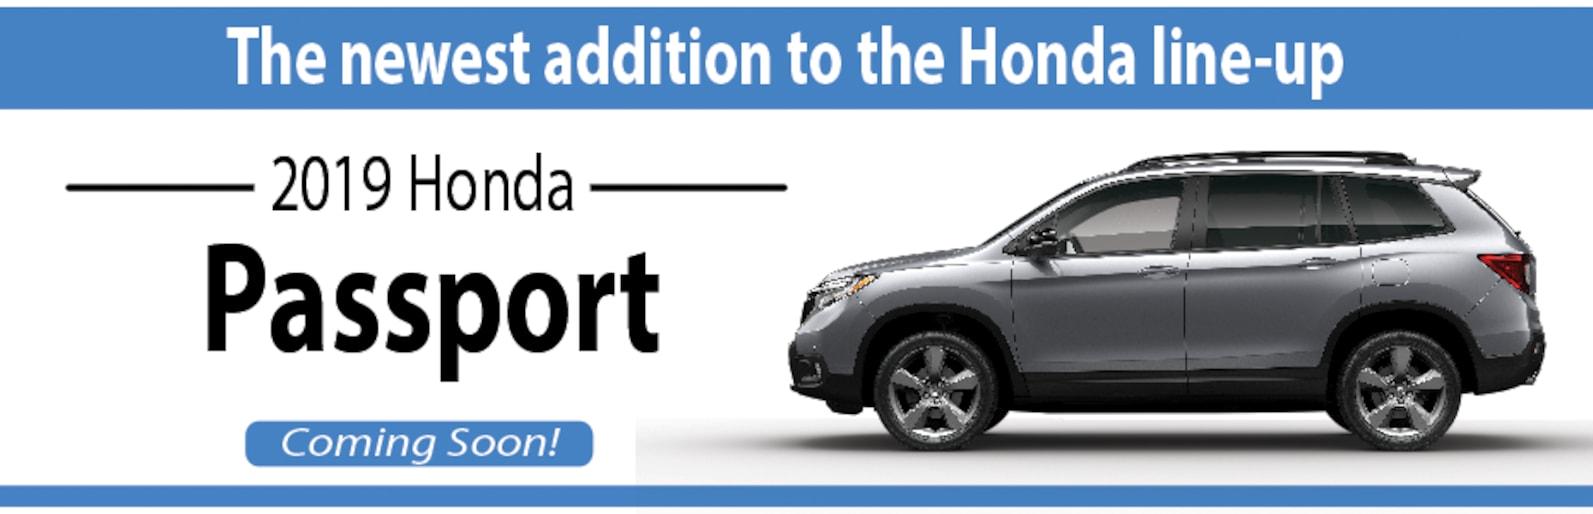 Honda Dealers Illinois >> Bill Walsh Honda New Honda Dealership In Ottawa Il